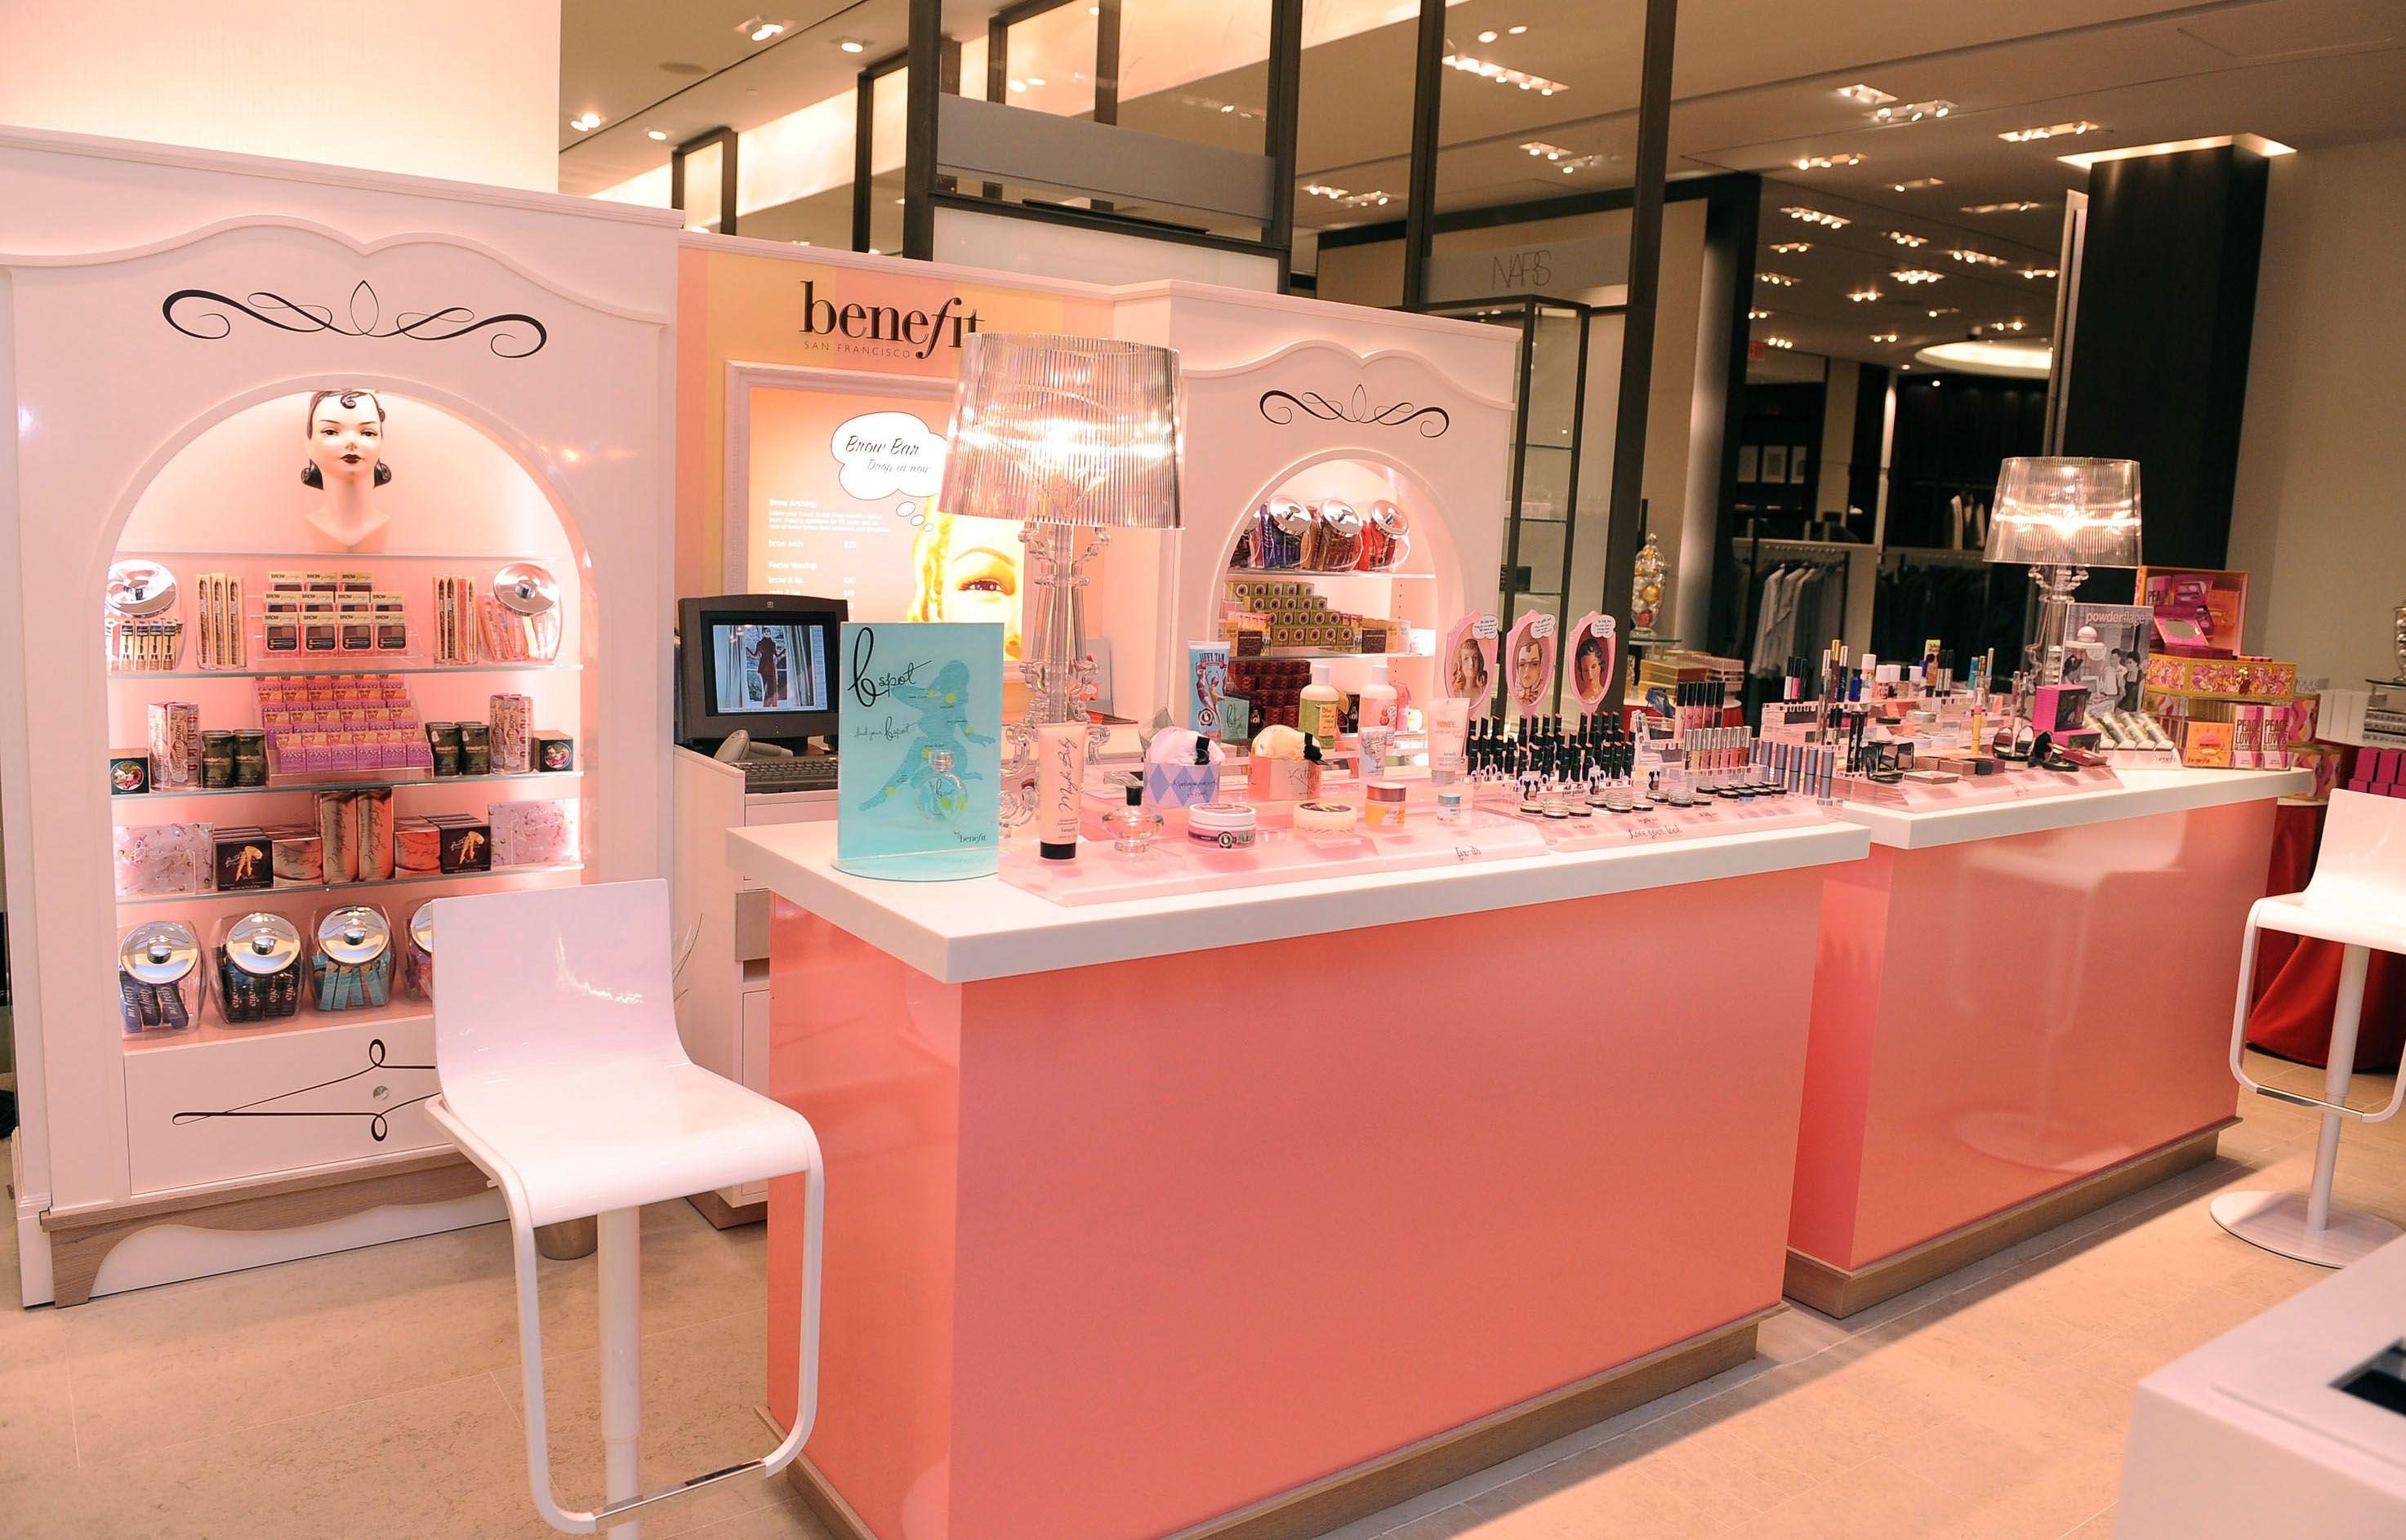 Brow Bar Benefit | Dream Job | Pinterest | Benefit cosmetics